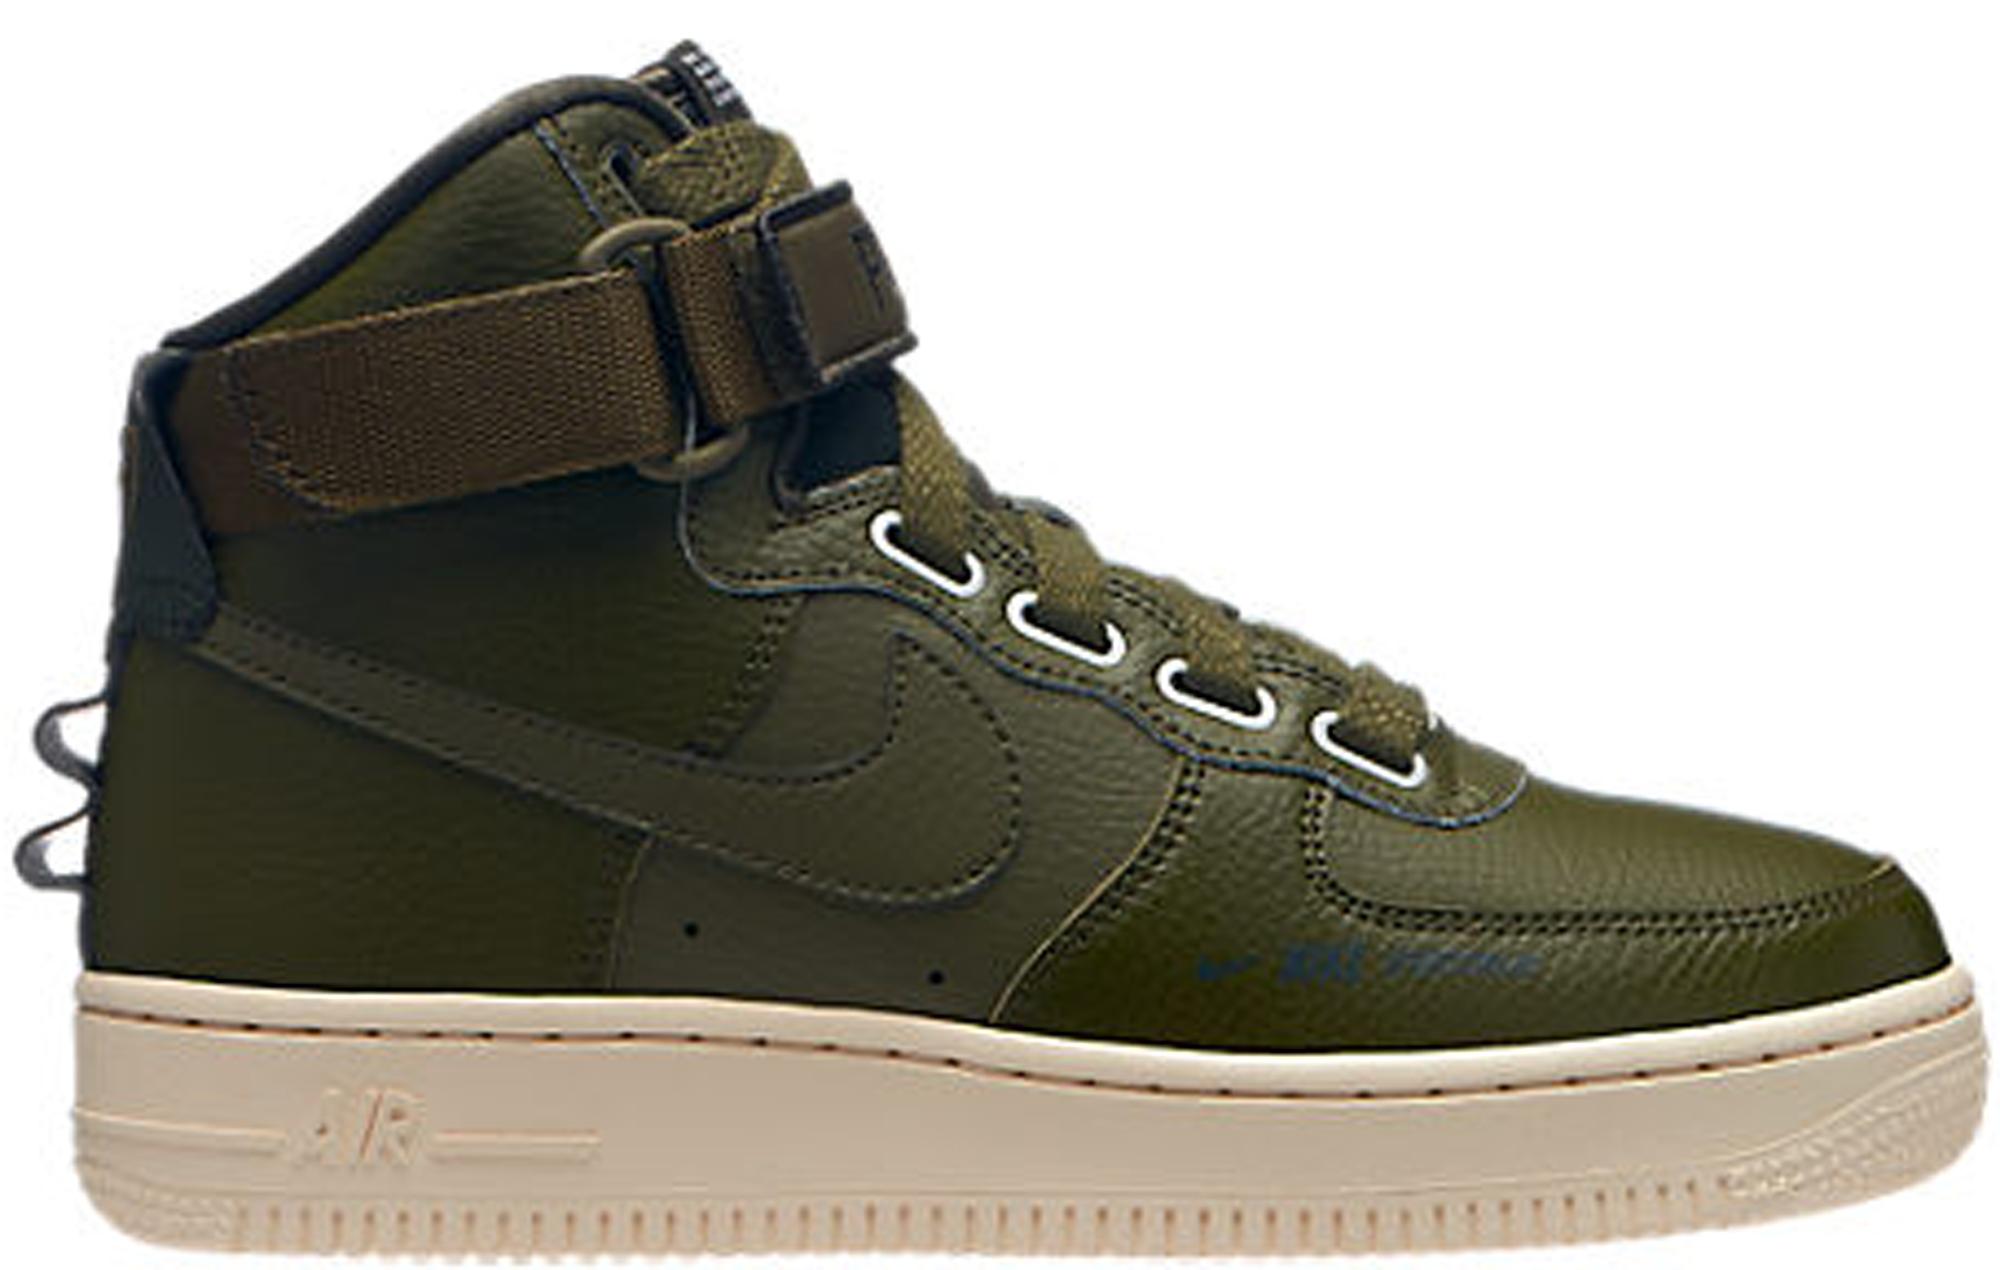 Nike Air Force 1 High Utility Olive